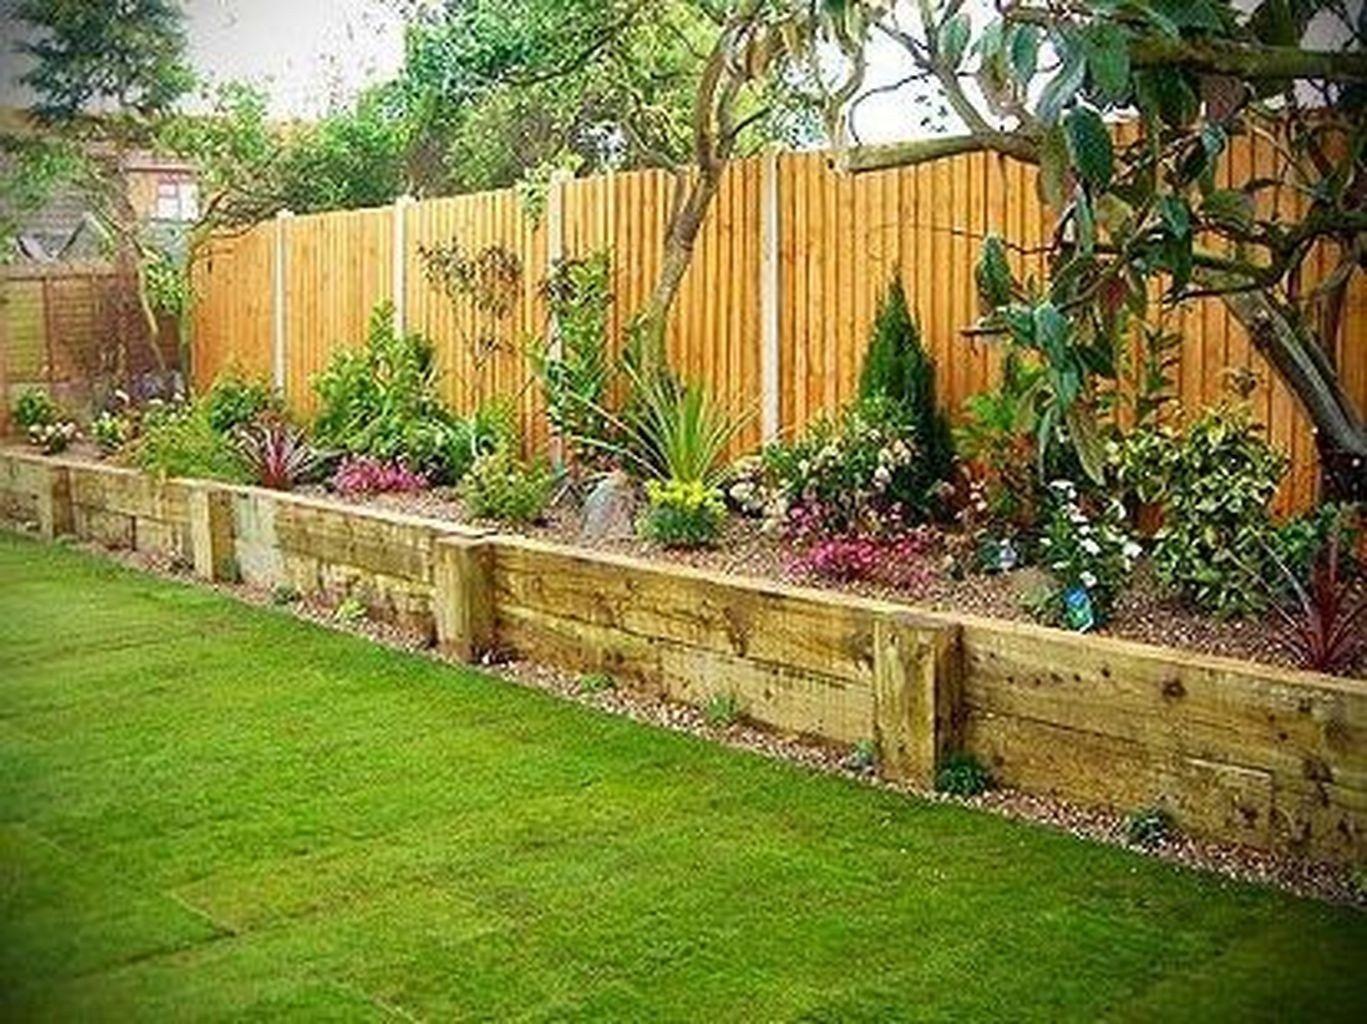 Inspiring Small Backyard Landscaping Ideas 08   Landscaping ideas ...